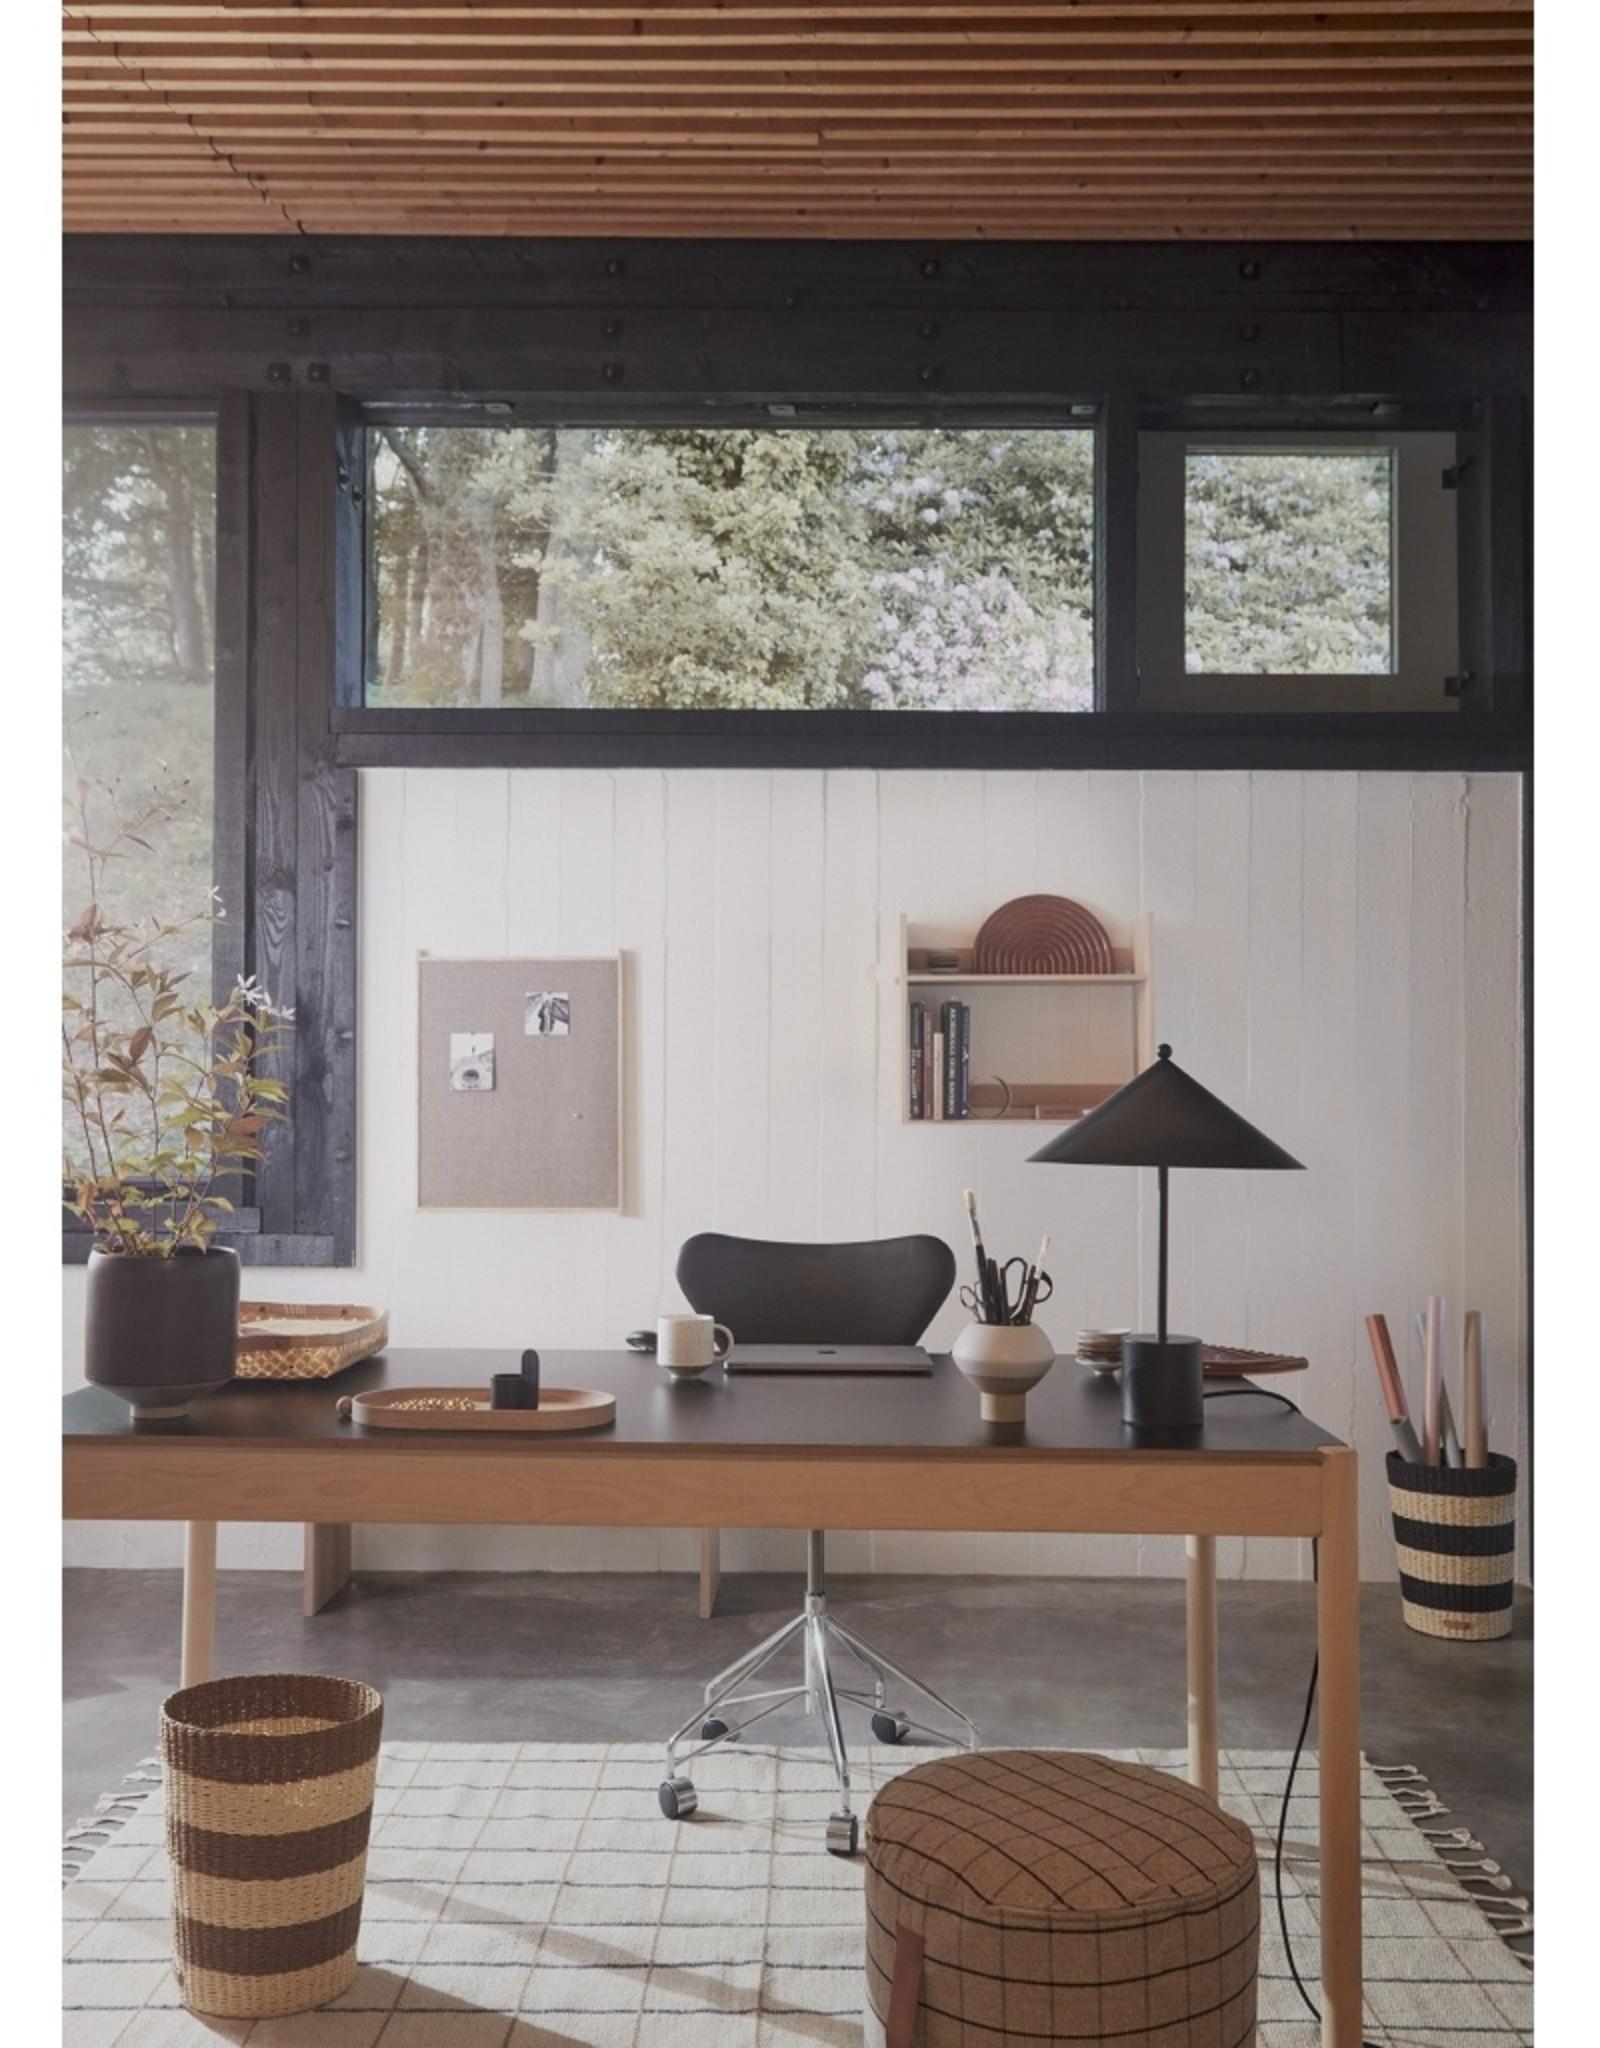 OYOY 'Grid' vloerkleed 140 x 200 cm